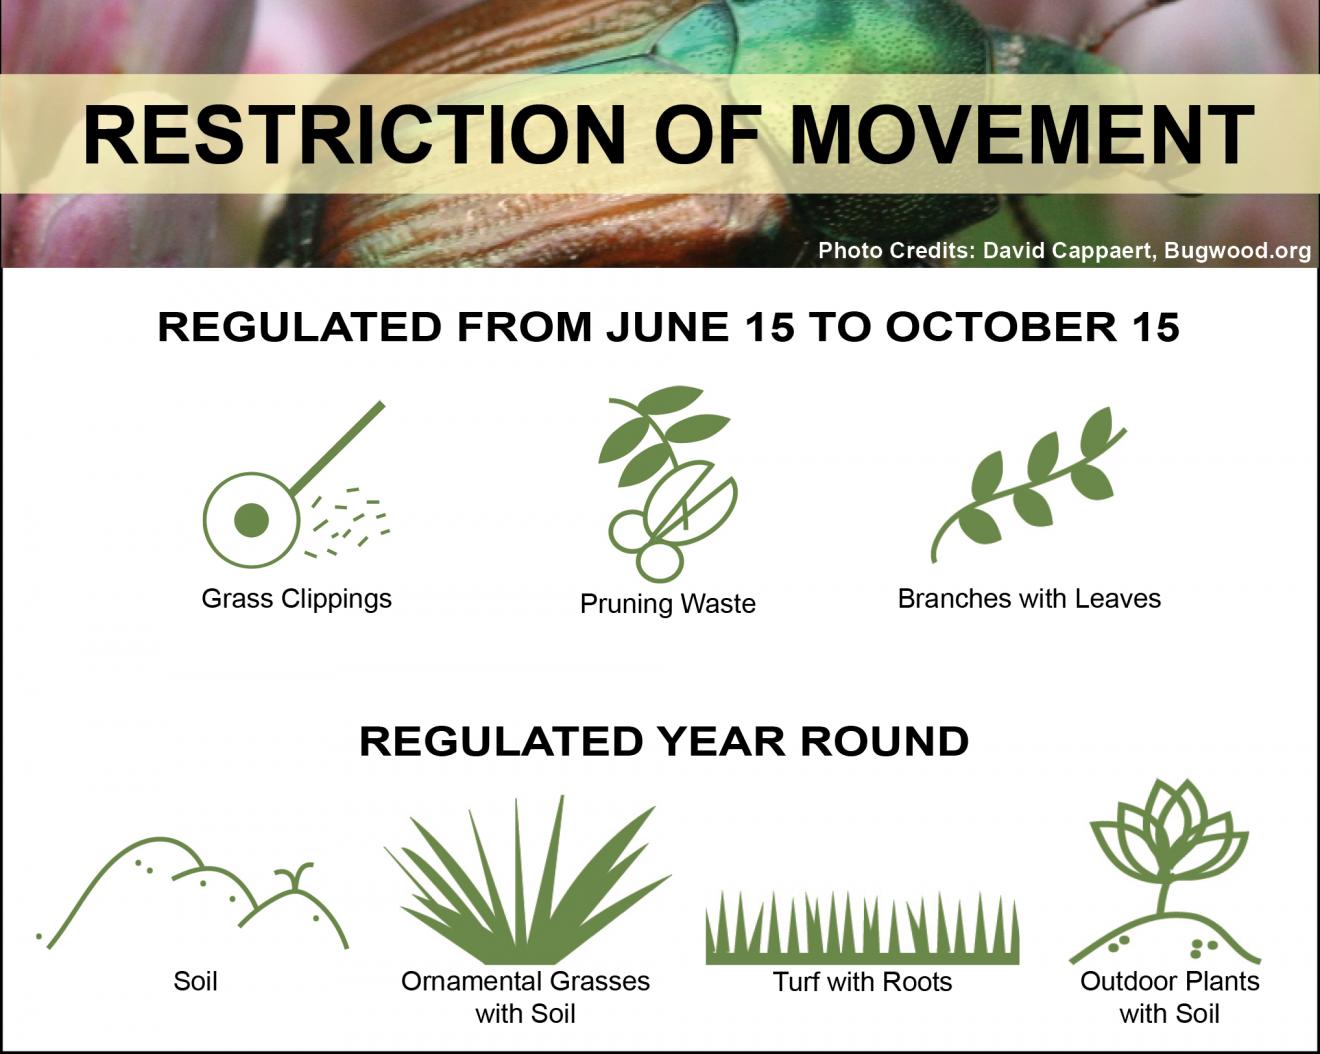 JB - Restriction of Movement